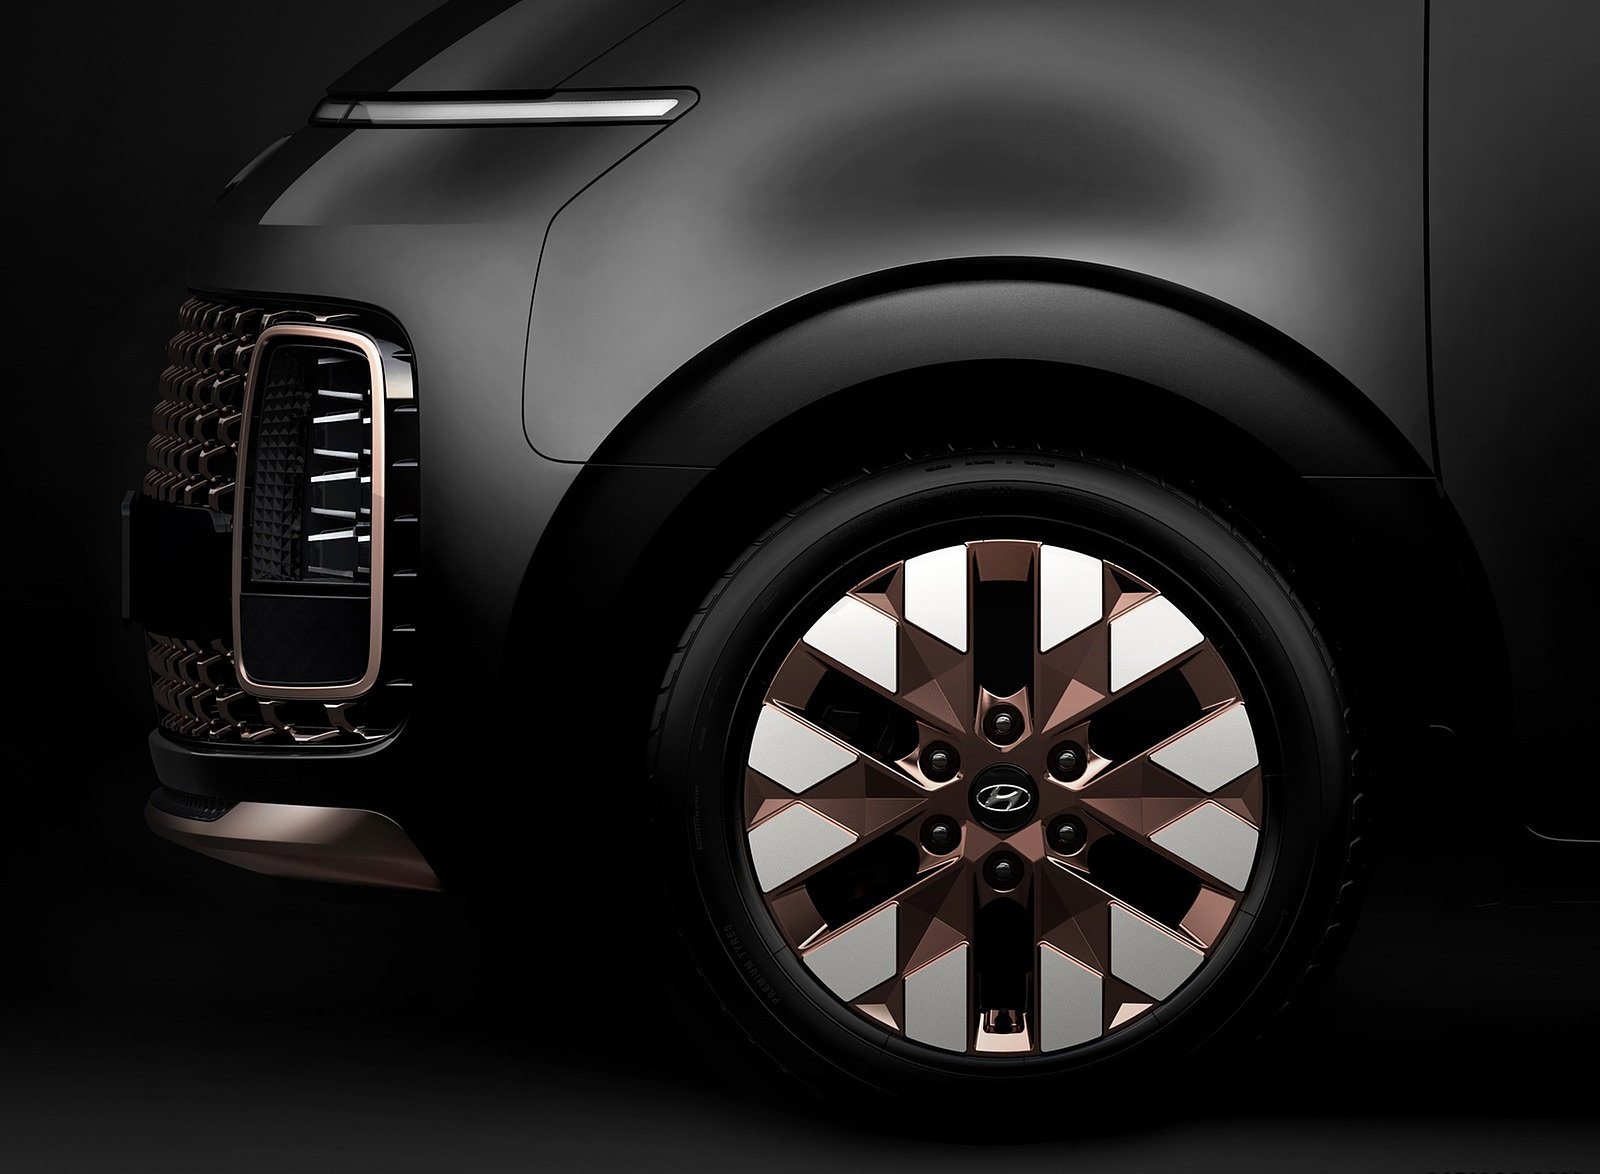 2022 Hyundai Staria Wheel Wallpapers (7)